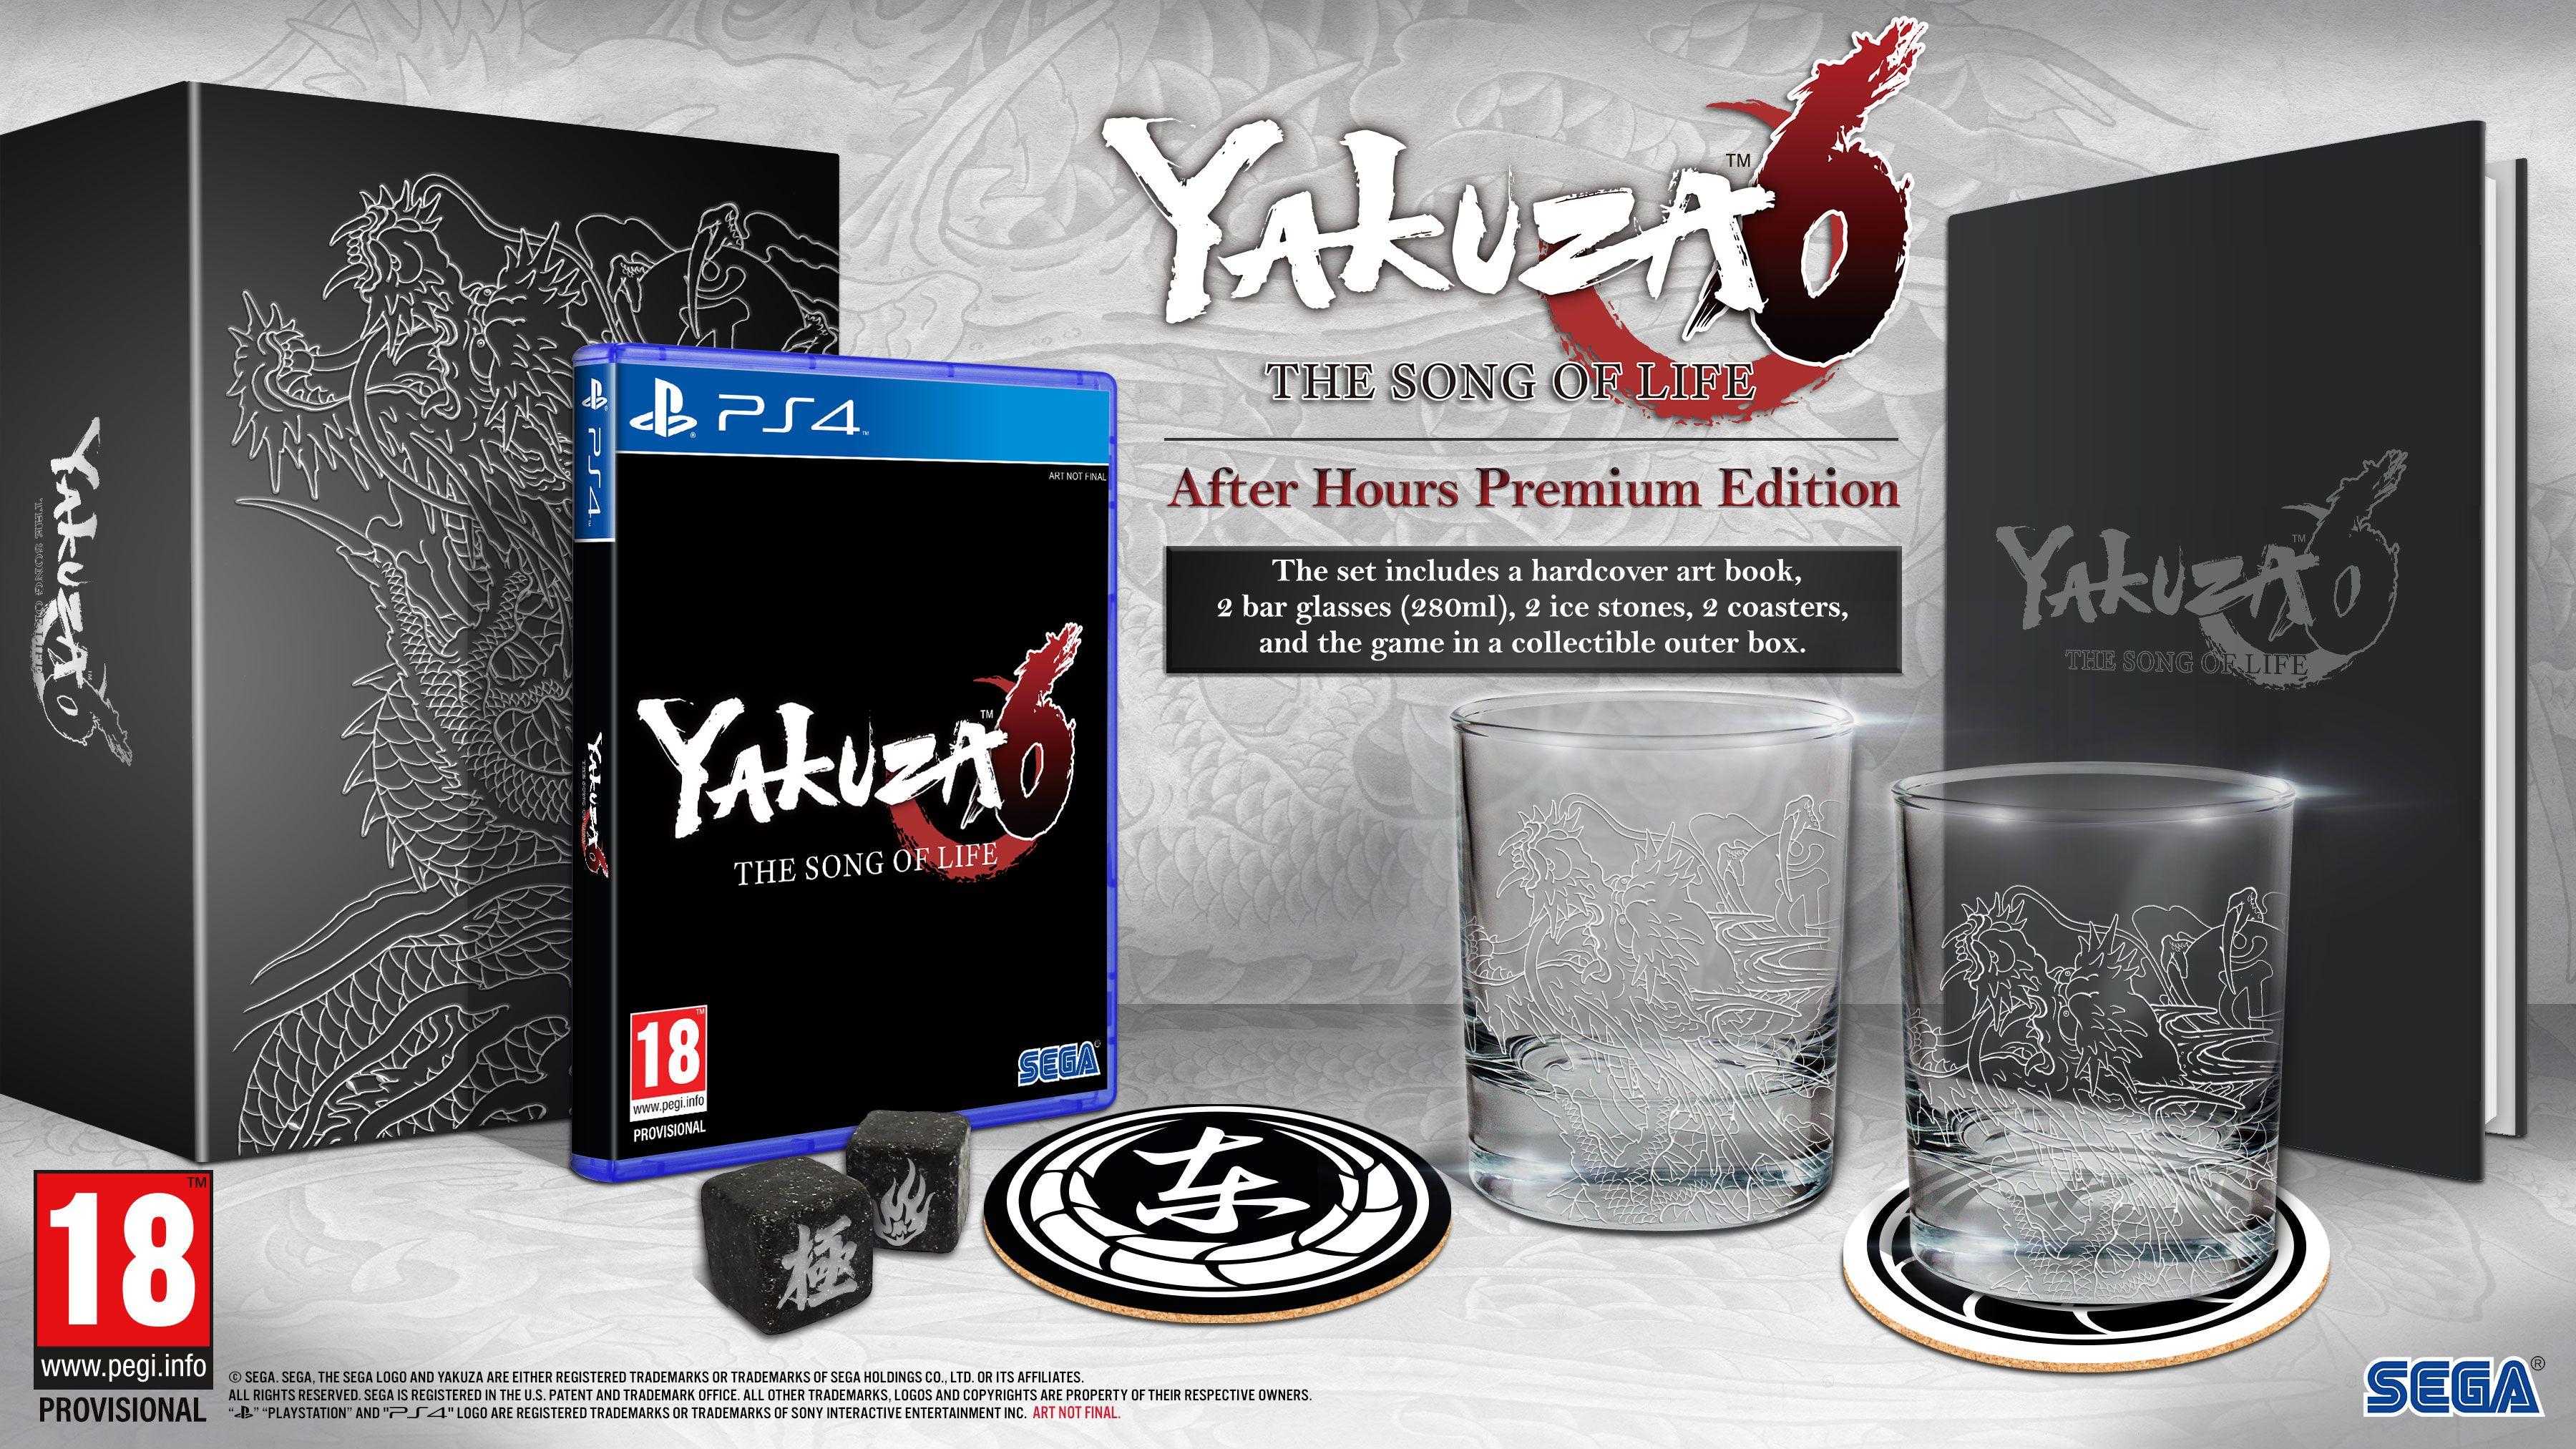 Yakuza 6 The Song of Life Screenshot - 0006